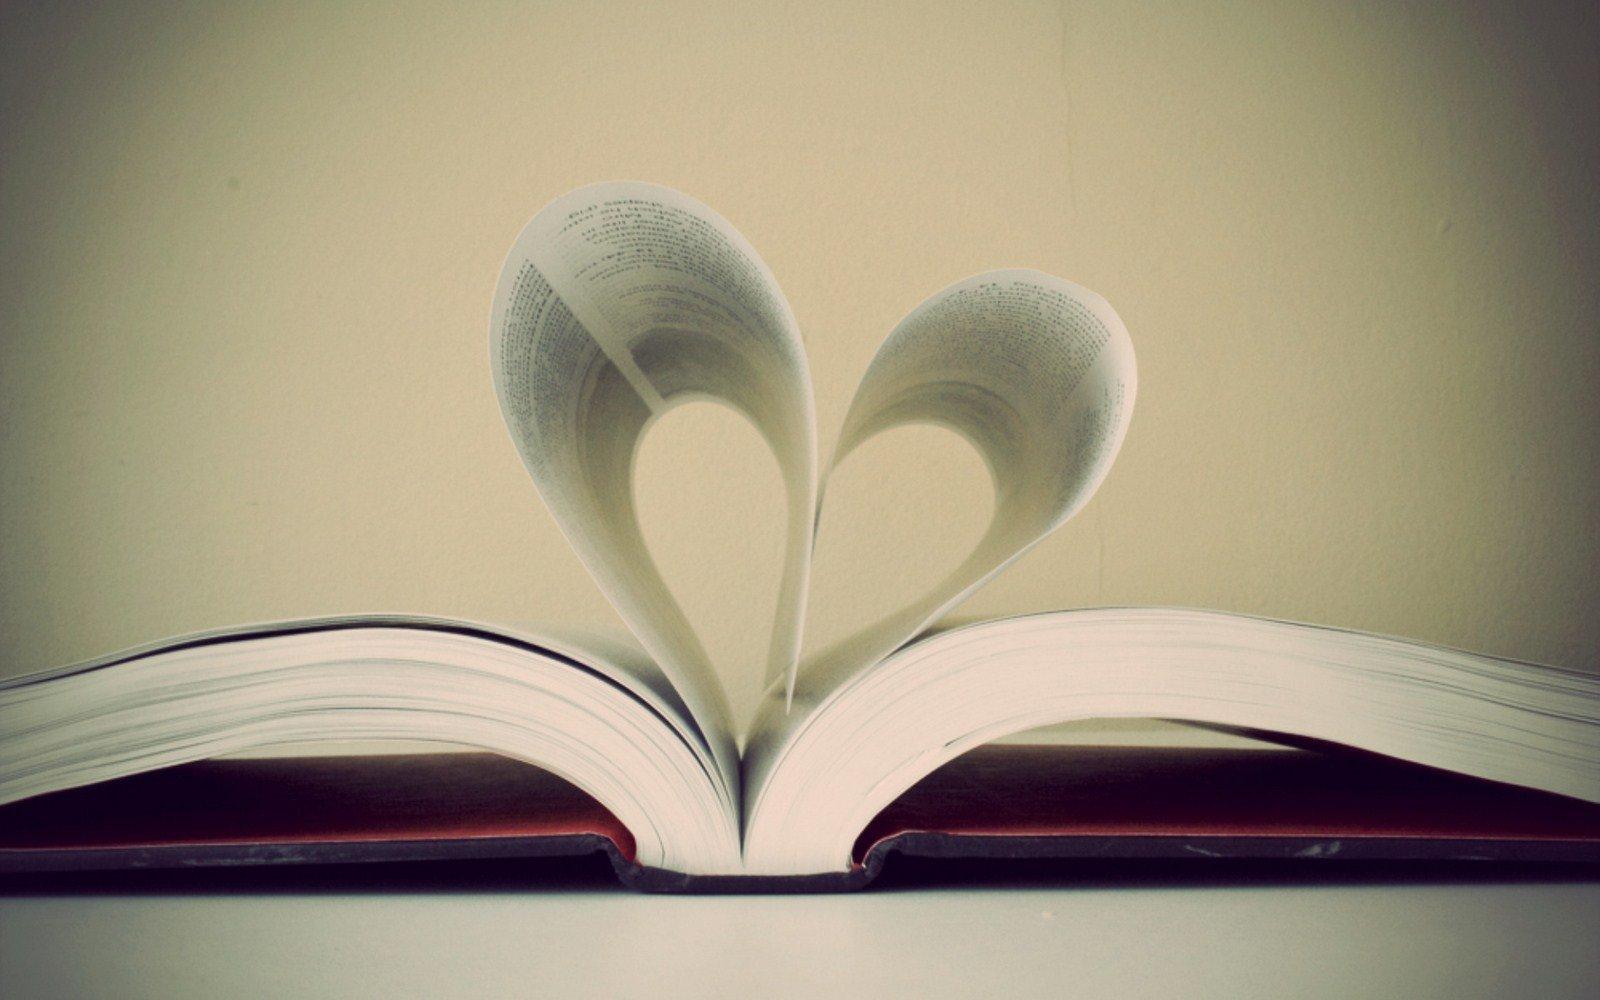 Book Sheet Page Heart Photo HD Love Wallpaper Love Wallpapers 1600x1000